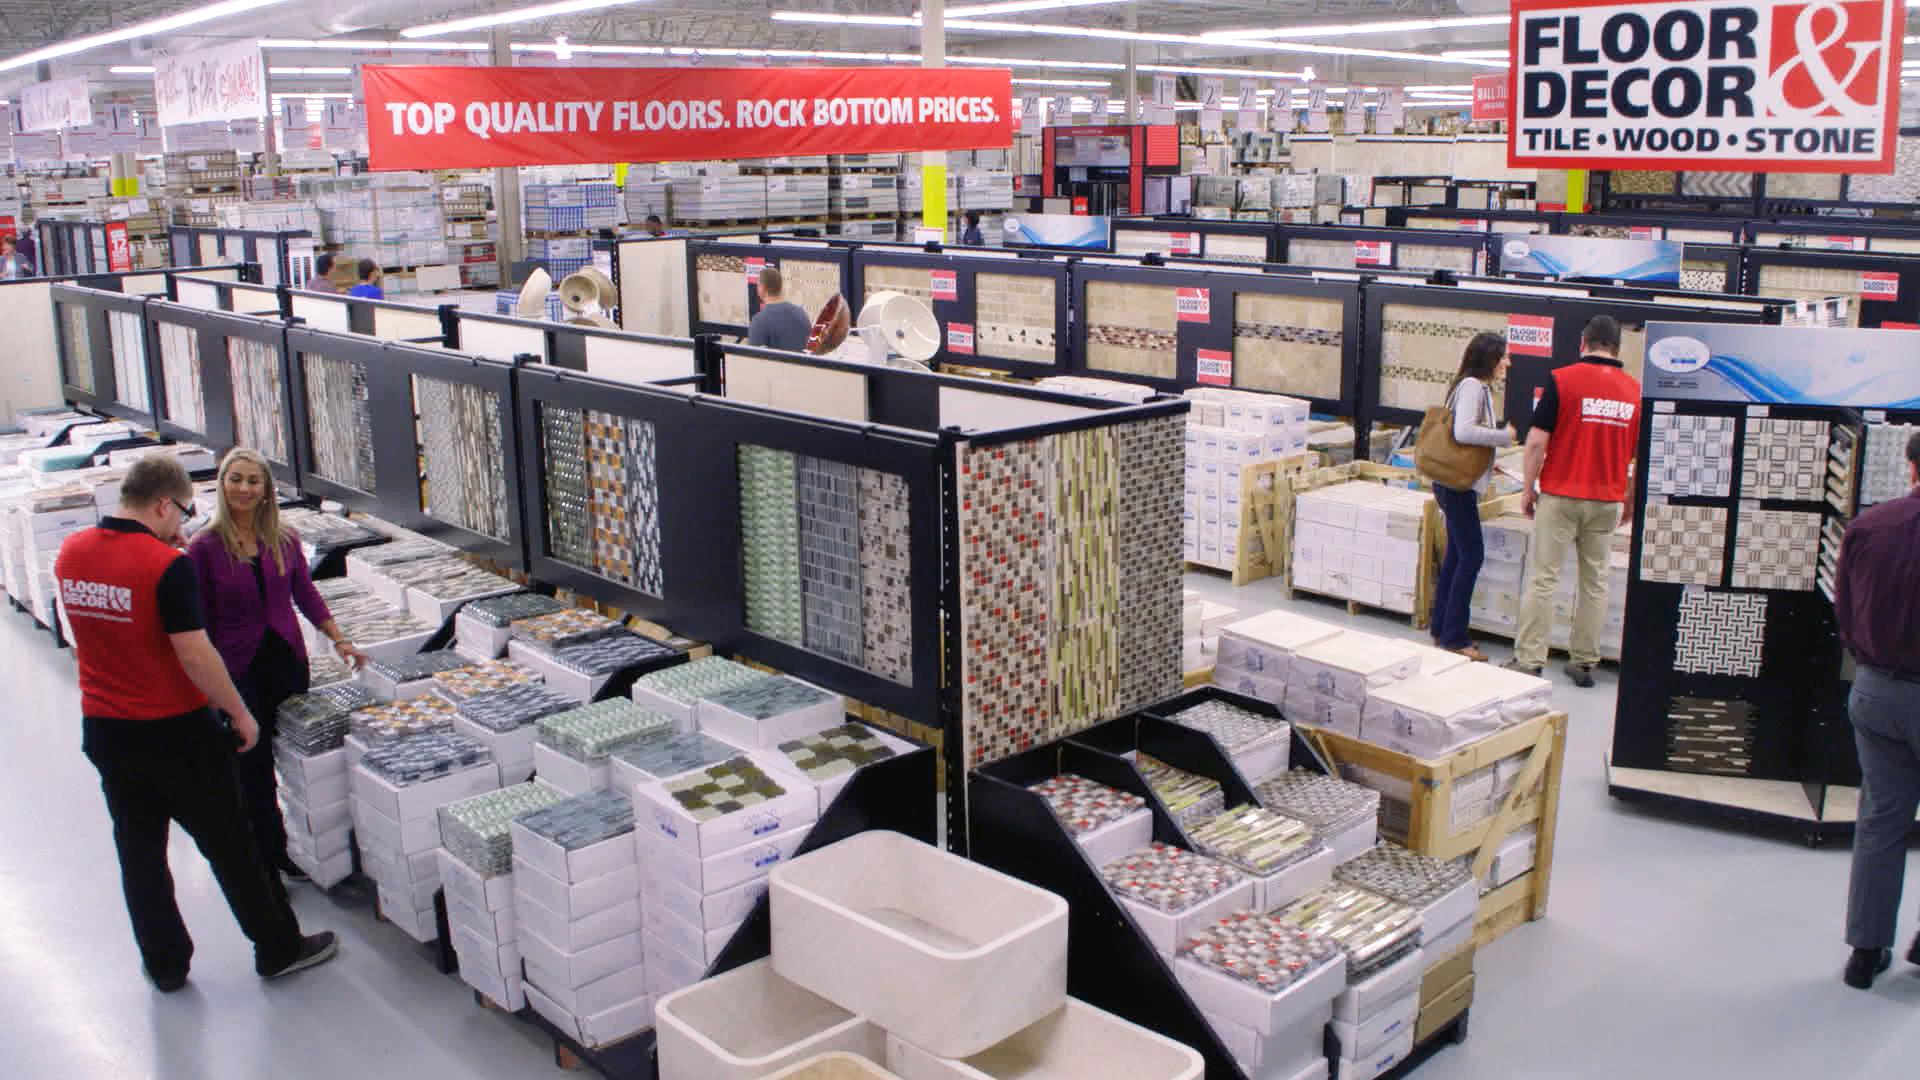 Floor Decor GlassDecoratives Image ProView - Stores like floor and decor